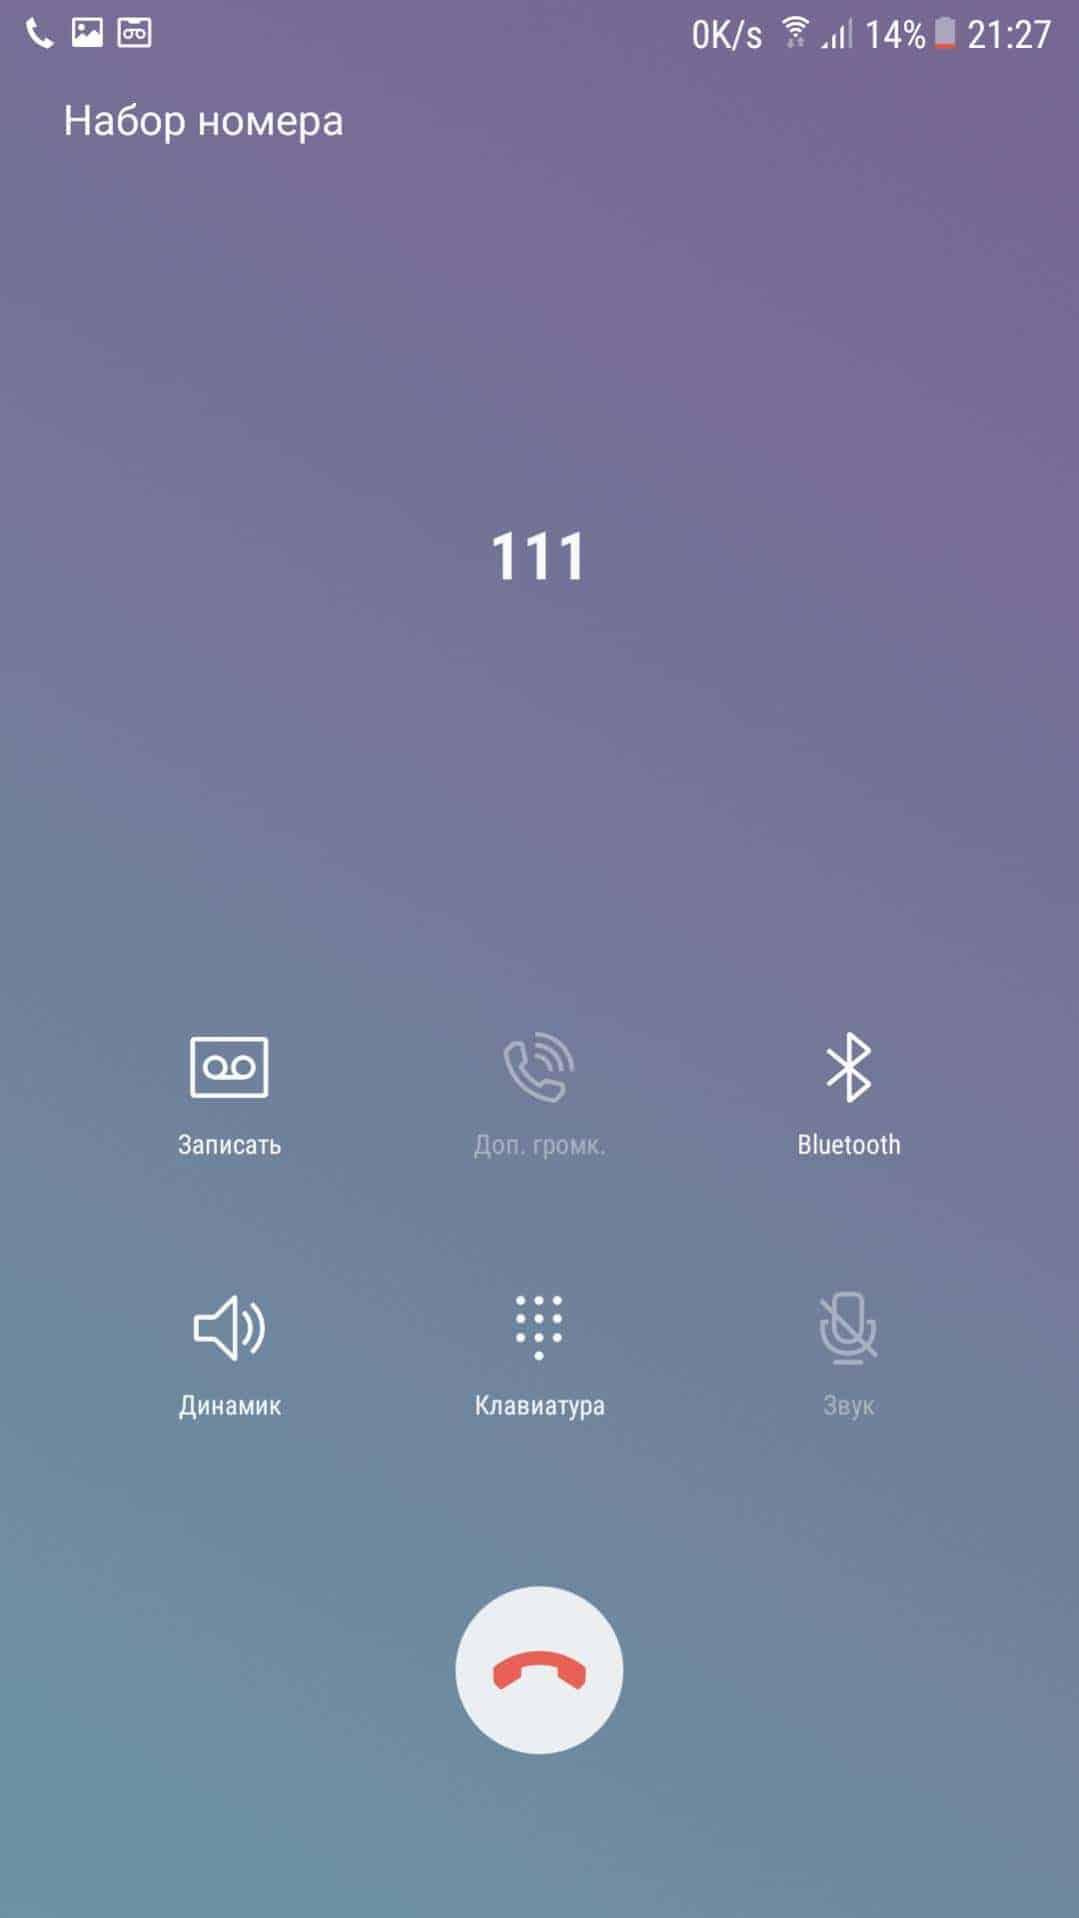 Galaxy A5 2016 Nougat screenshot KK 3